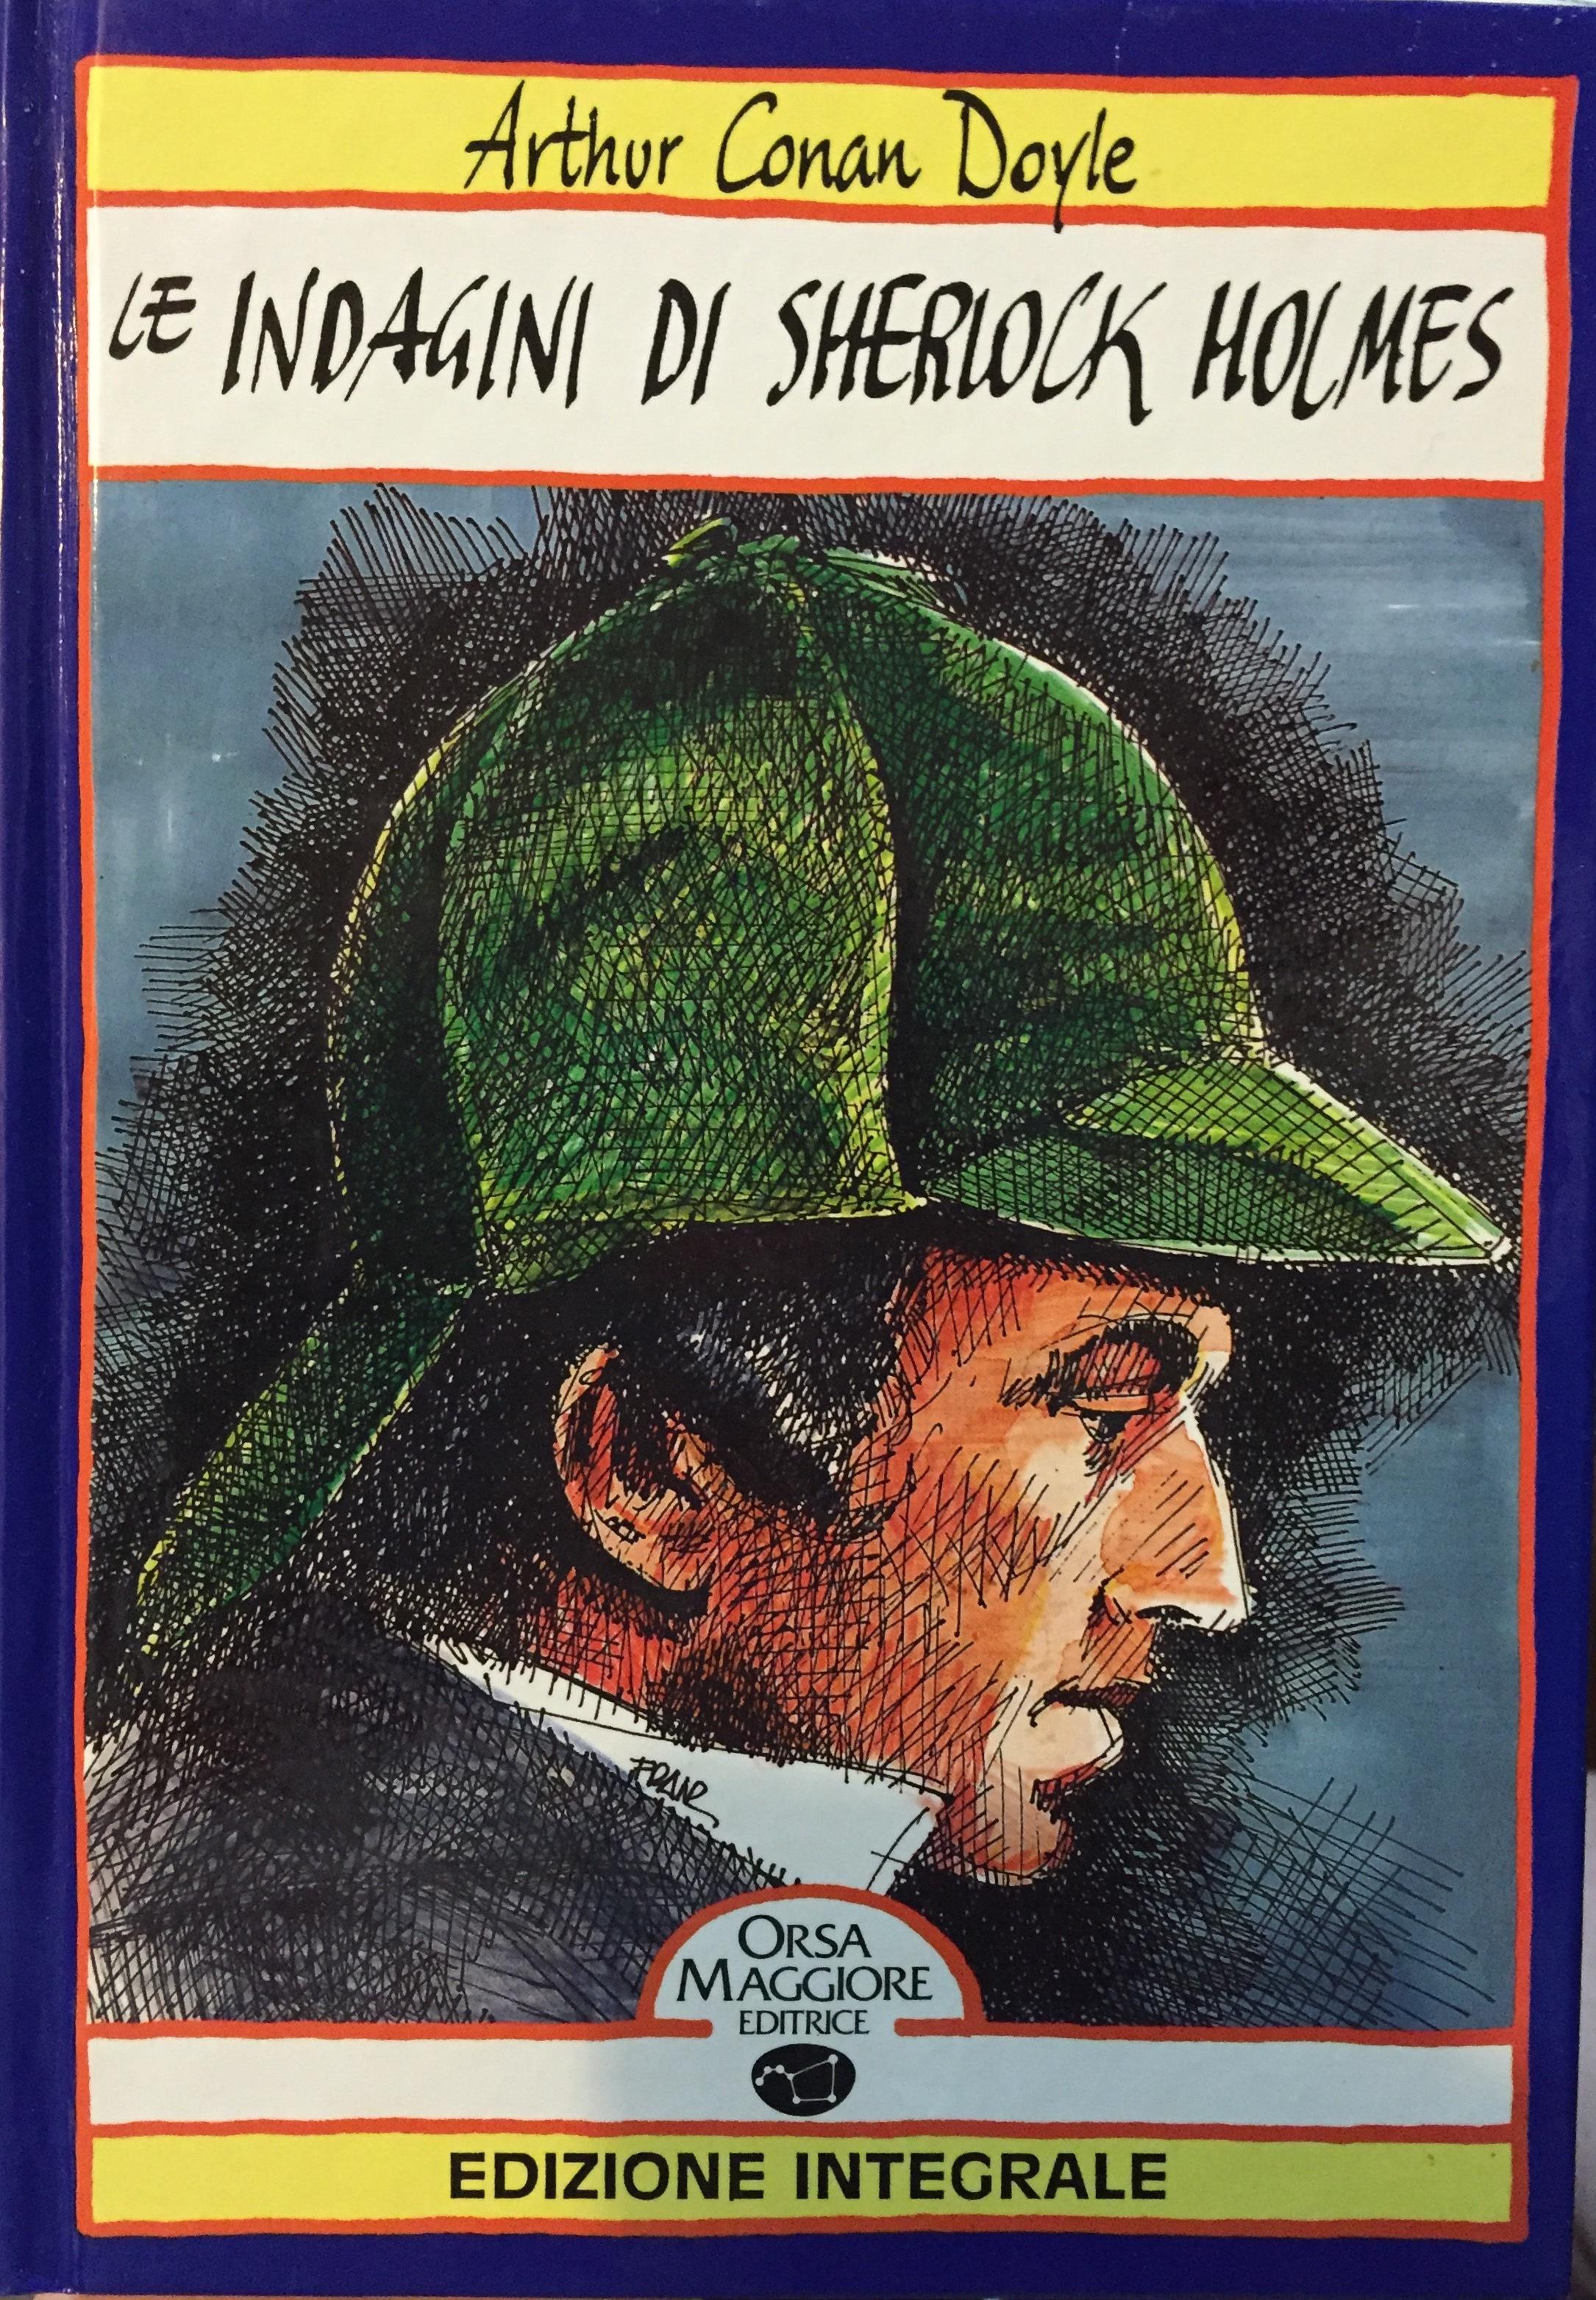 Le indagini di Sherlock Holmes Arthur Conan Doyle